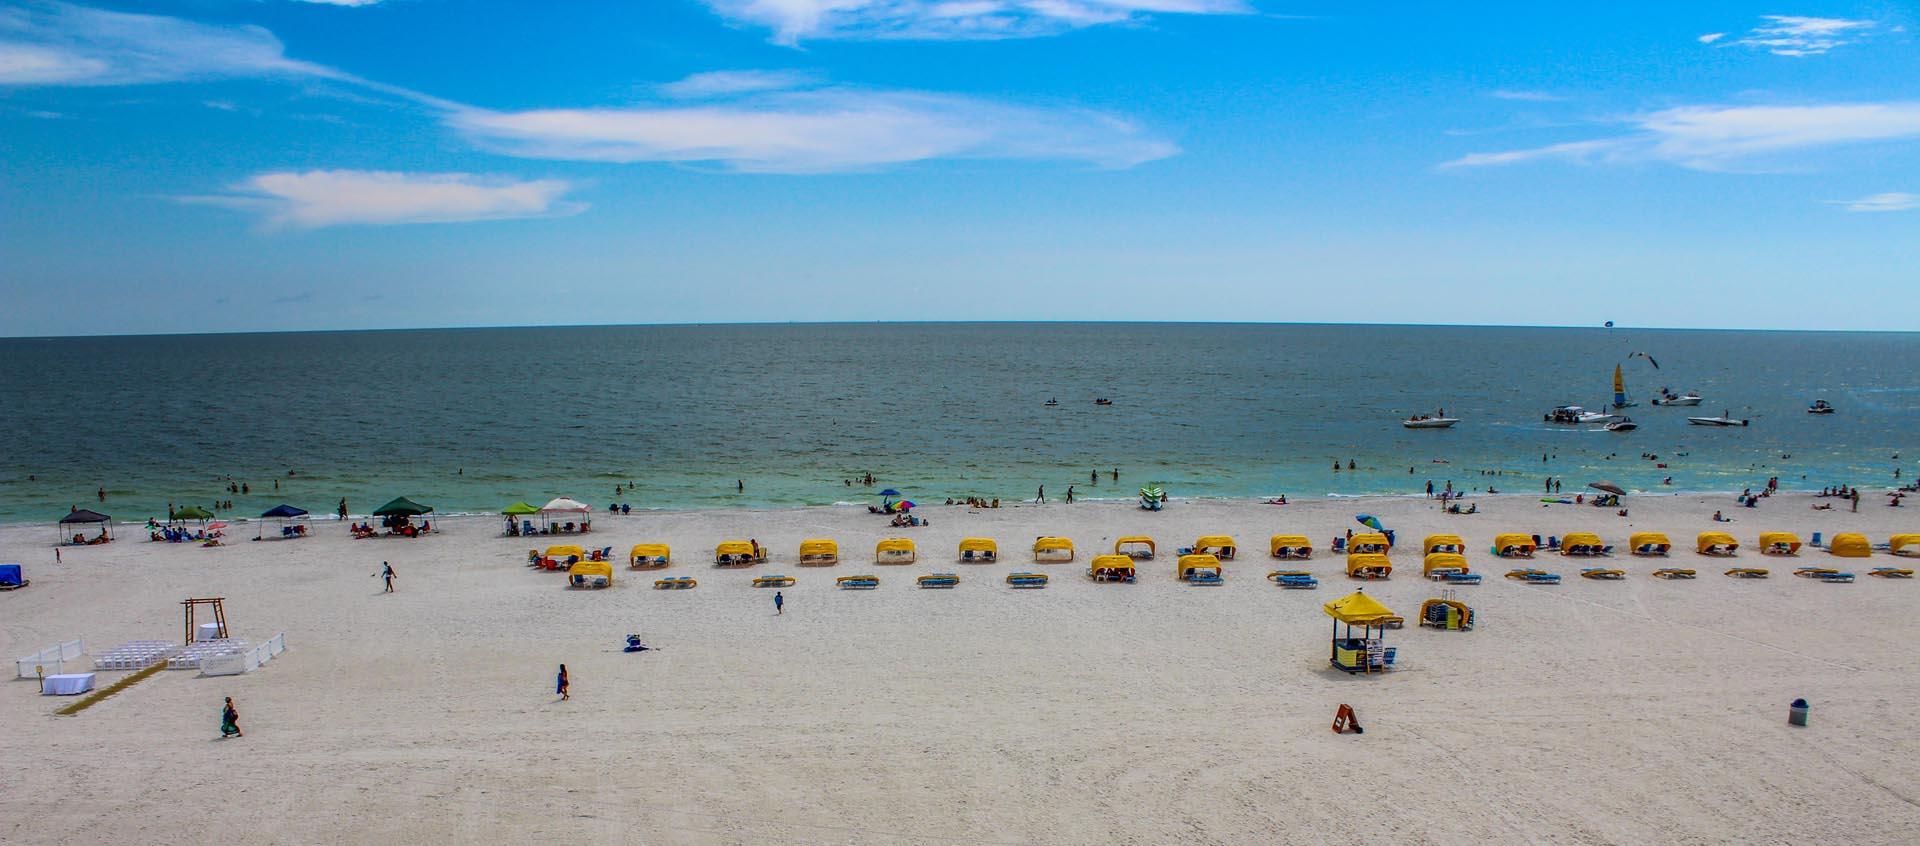 Coral Reef Beach Resort Beachfront